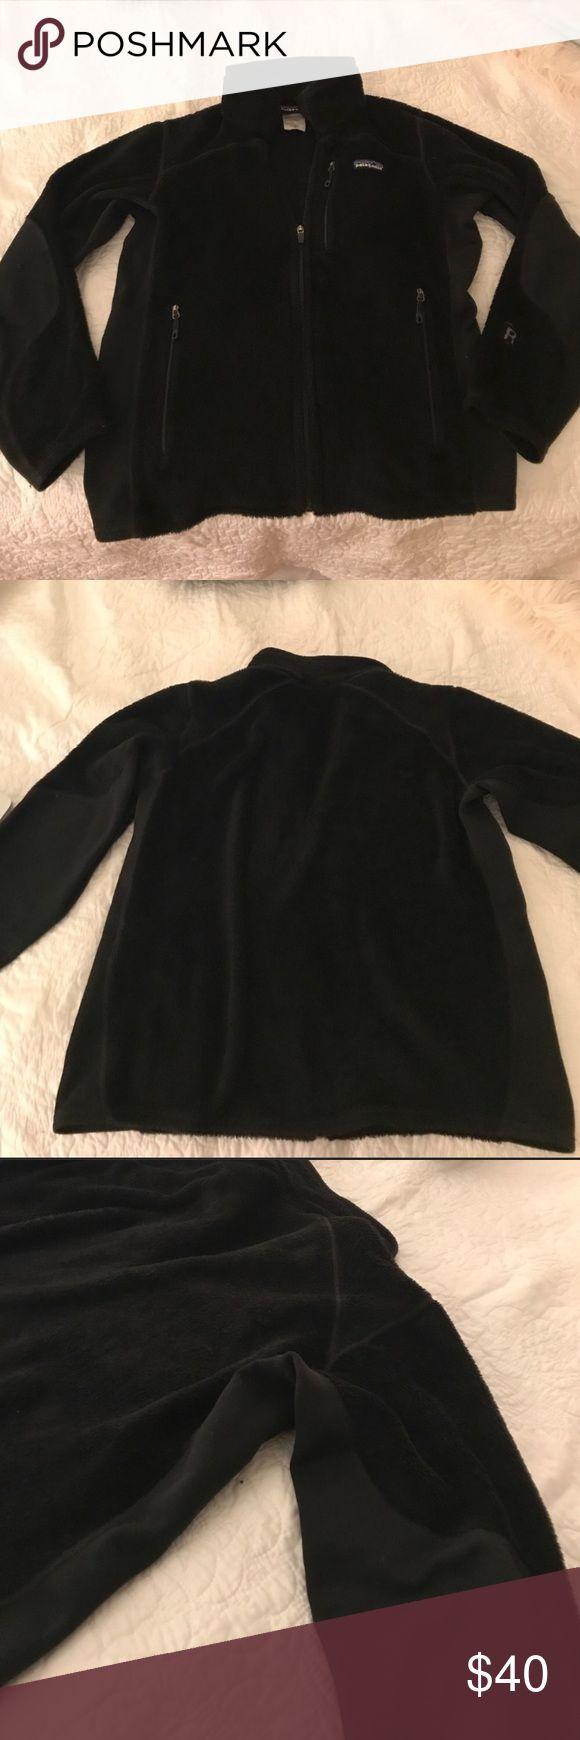 Patagonia fleece jacket sz M Black Patagonia fleece jacket. Size medium. R series. Good condition. Super comfortable. Patagonia Jackets & Coats